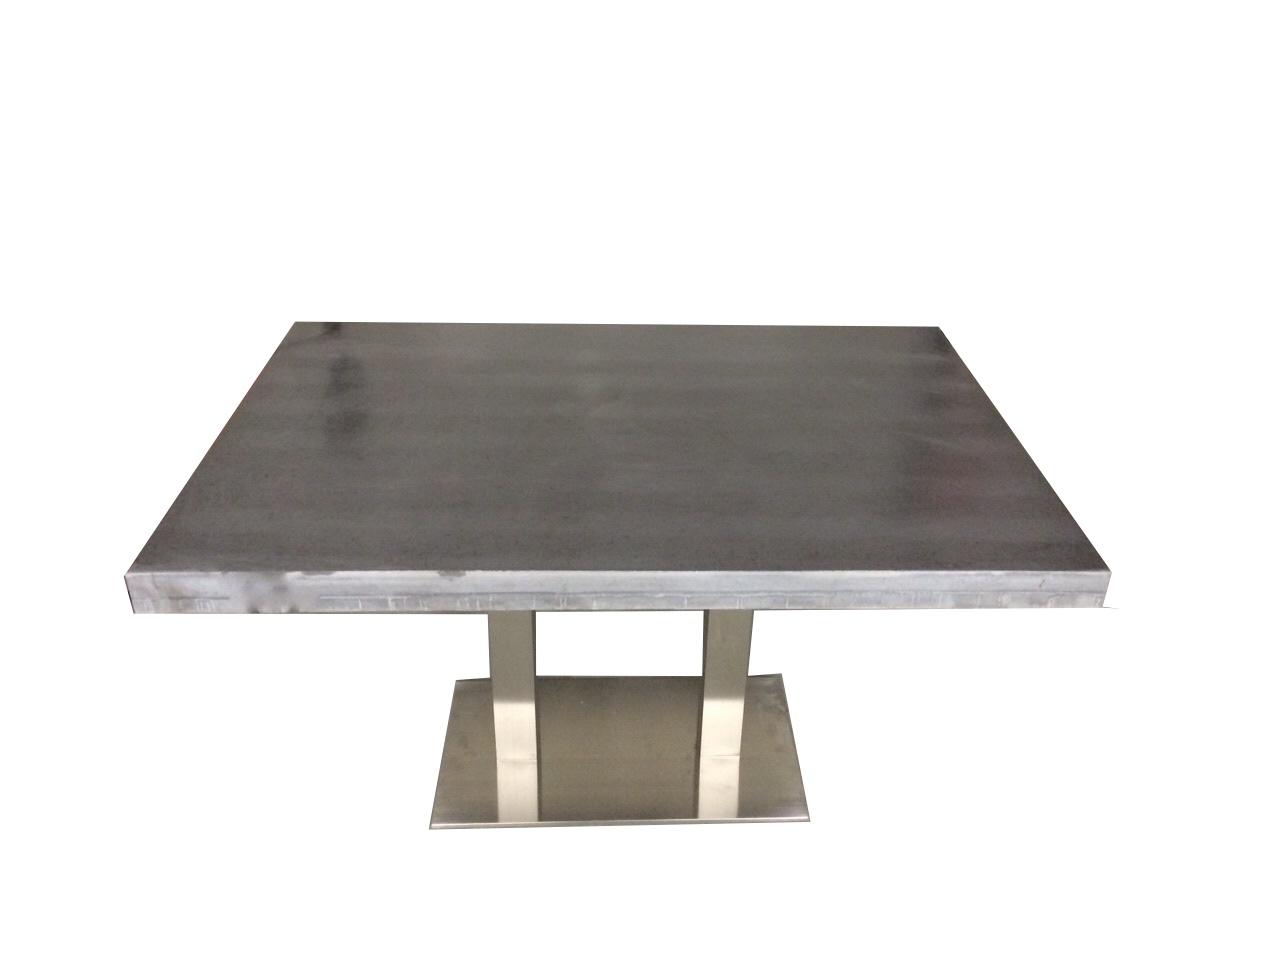 Betonnen tafel met RVS onderstel   Beton Cir u00e9 Centrum